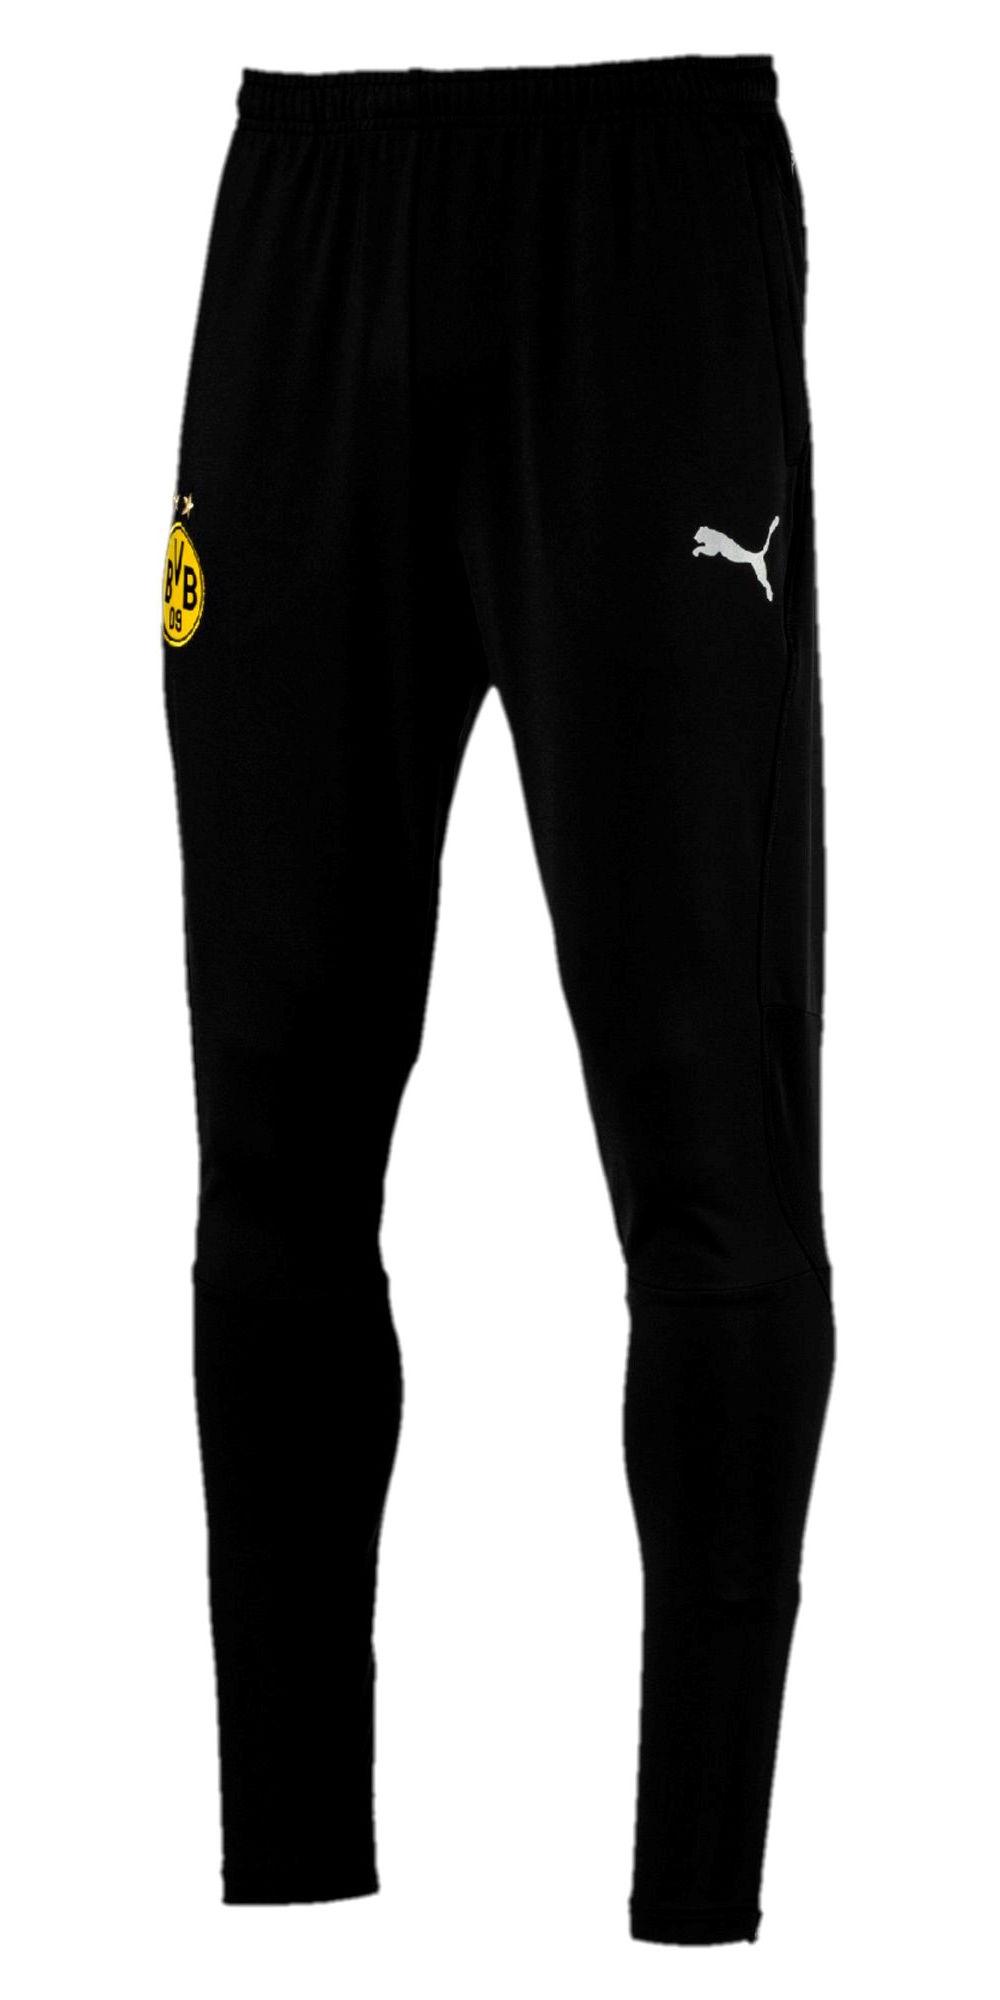 Borussia Dortmund BVB Puma Track Pants Hose 2018 19 training